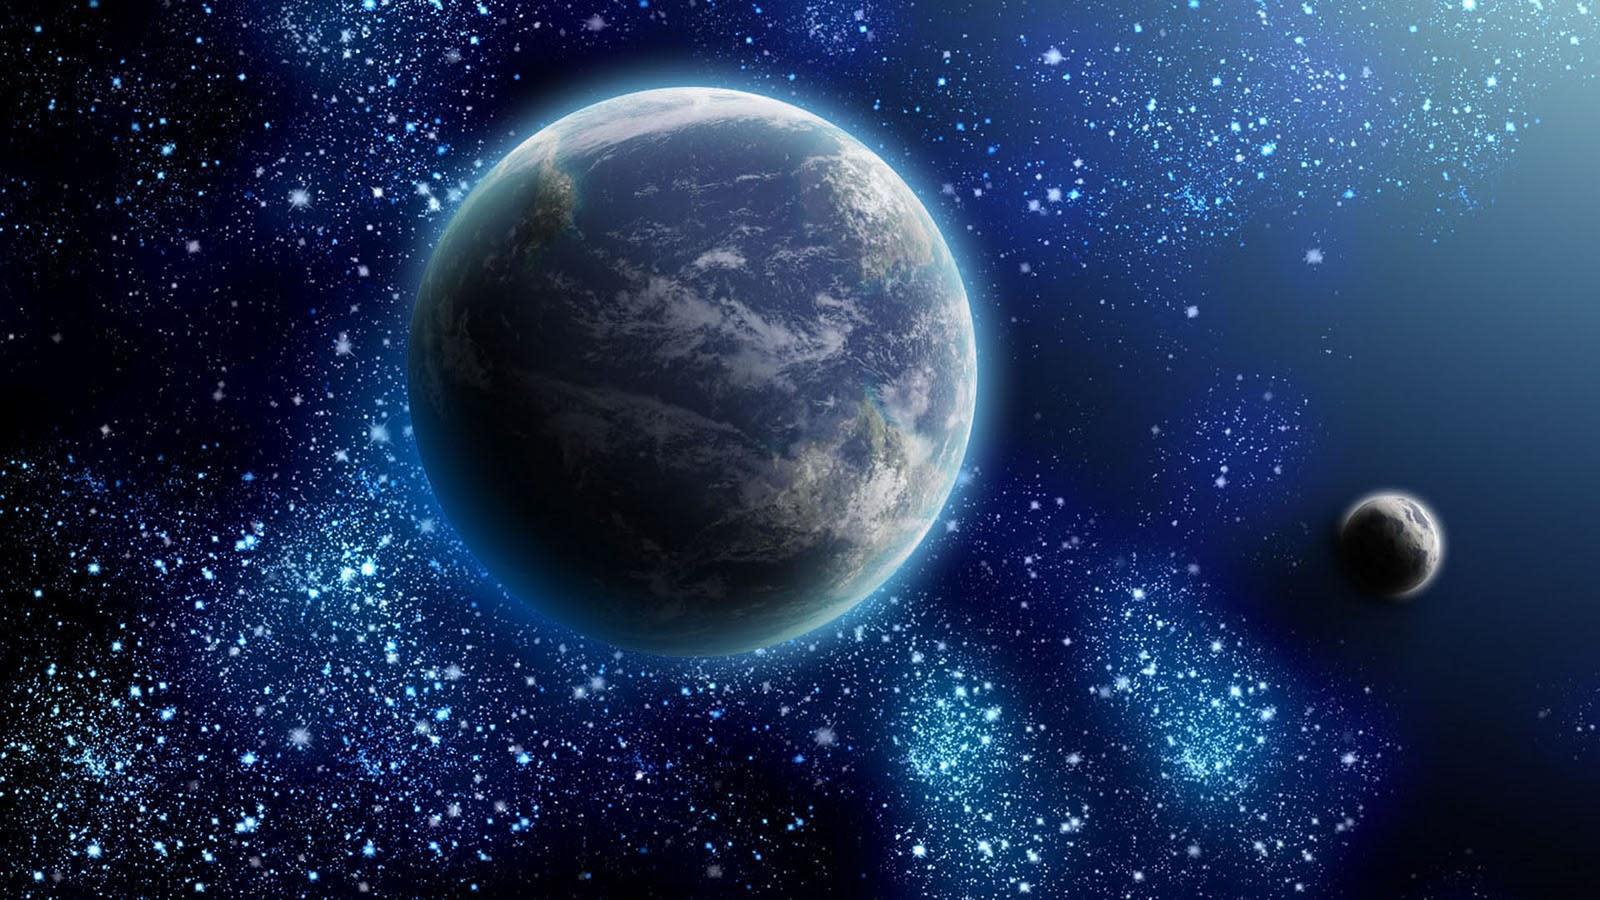 30 Space Planets and Universe Best HD Wallpapers { SET- 25 } خلفيات جديدة للكواكب!